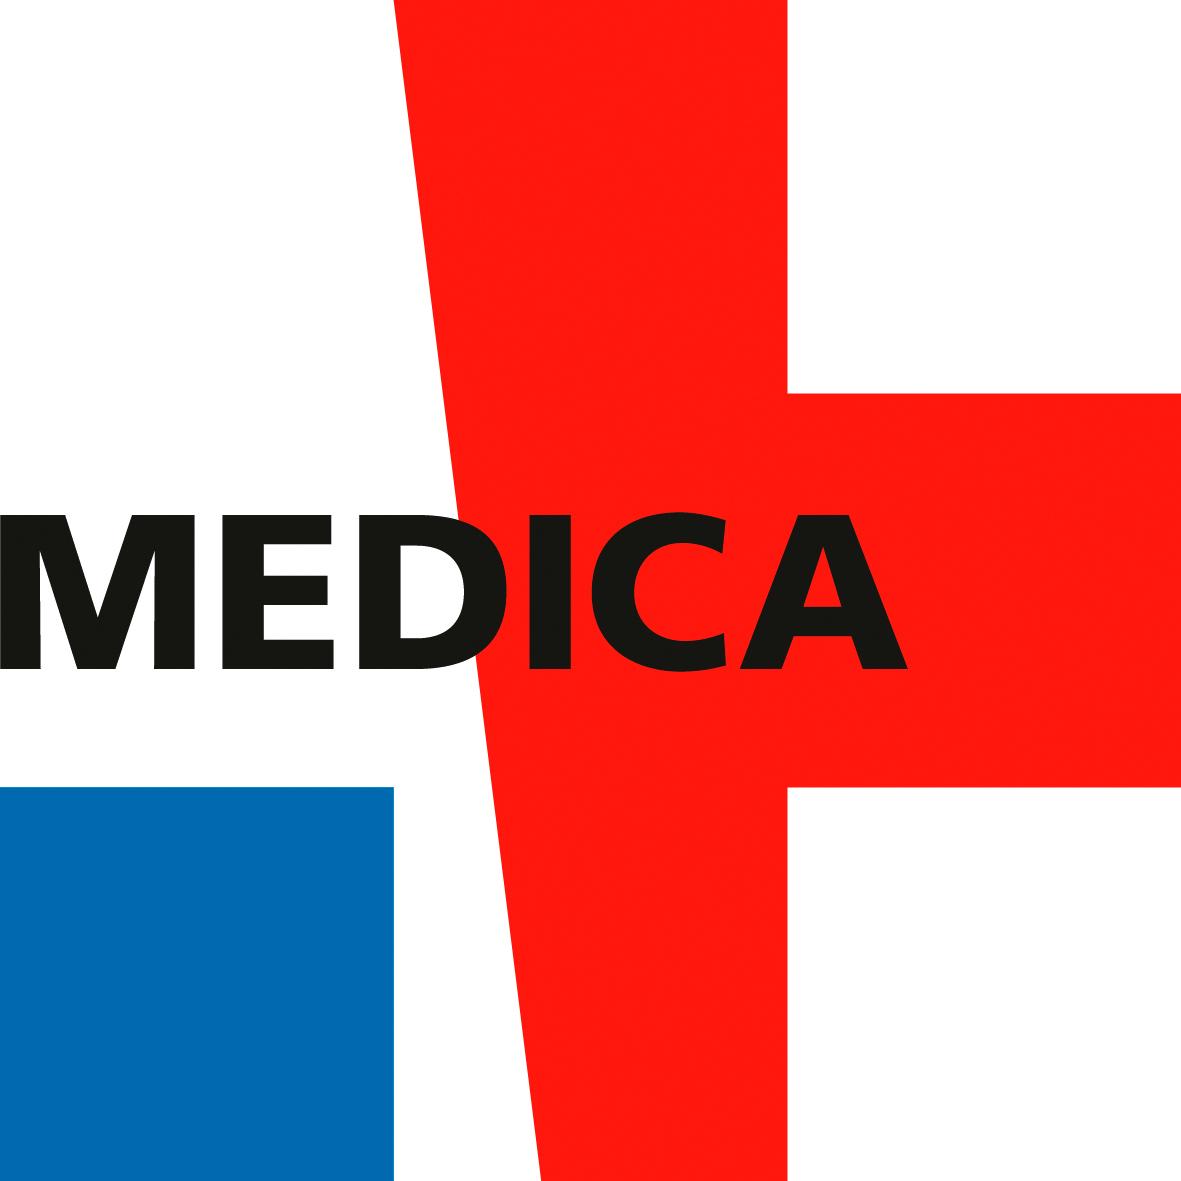 Medica Medizintechnik Messe